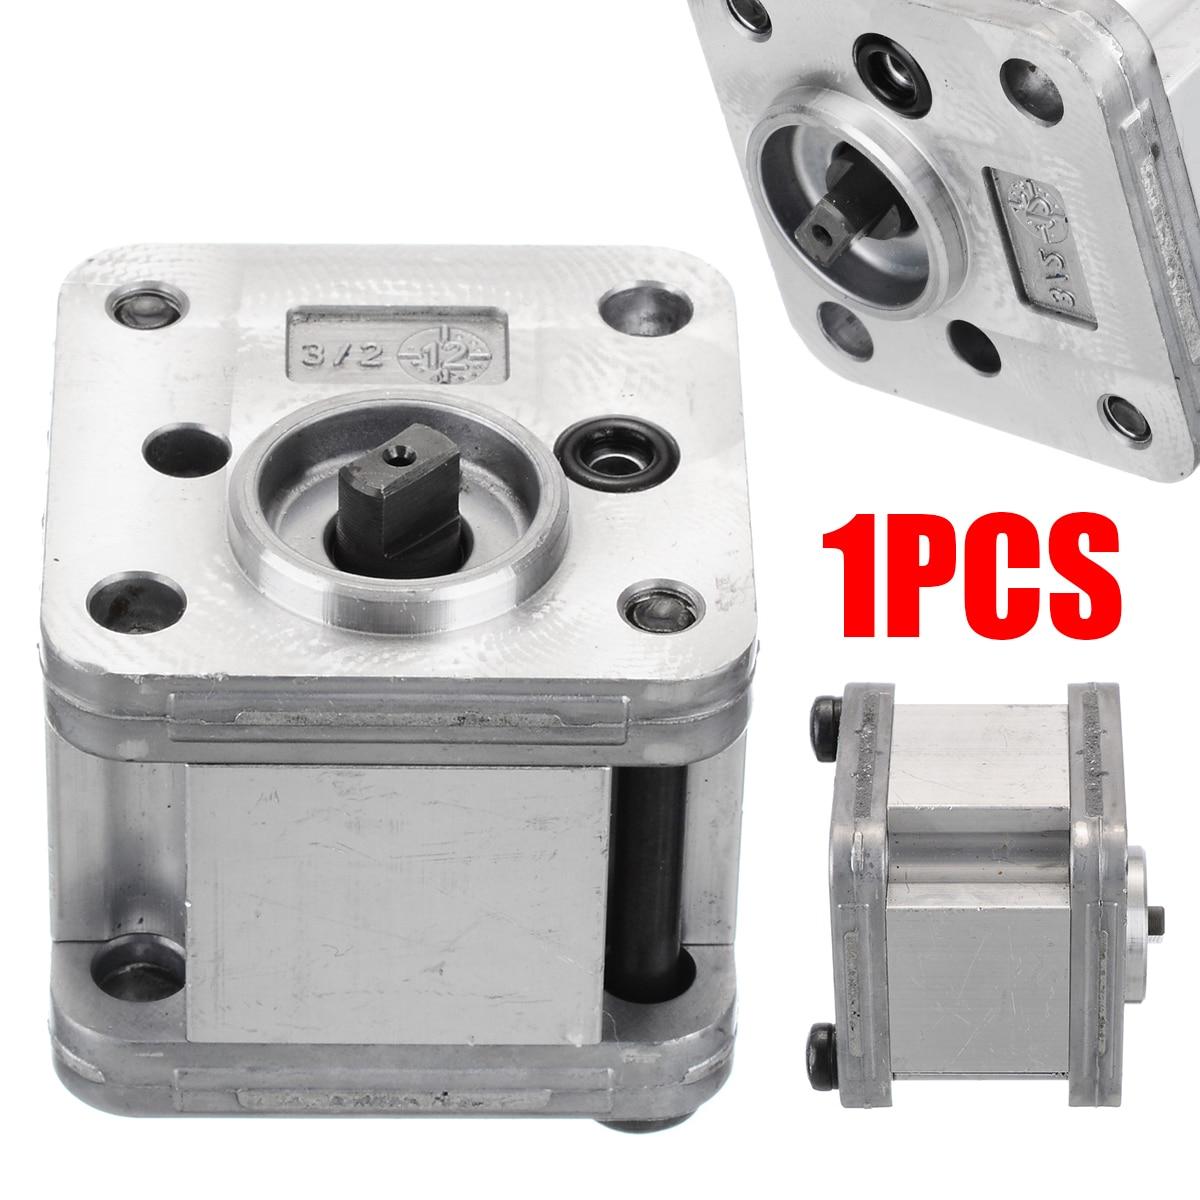 1Pcs Hydraulic Gear Pump Metal Gear Pump Hydraulic Model Excavating Machinery High Quality For Home Tools